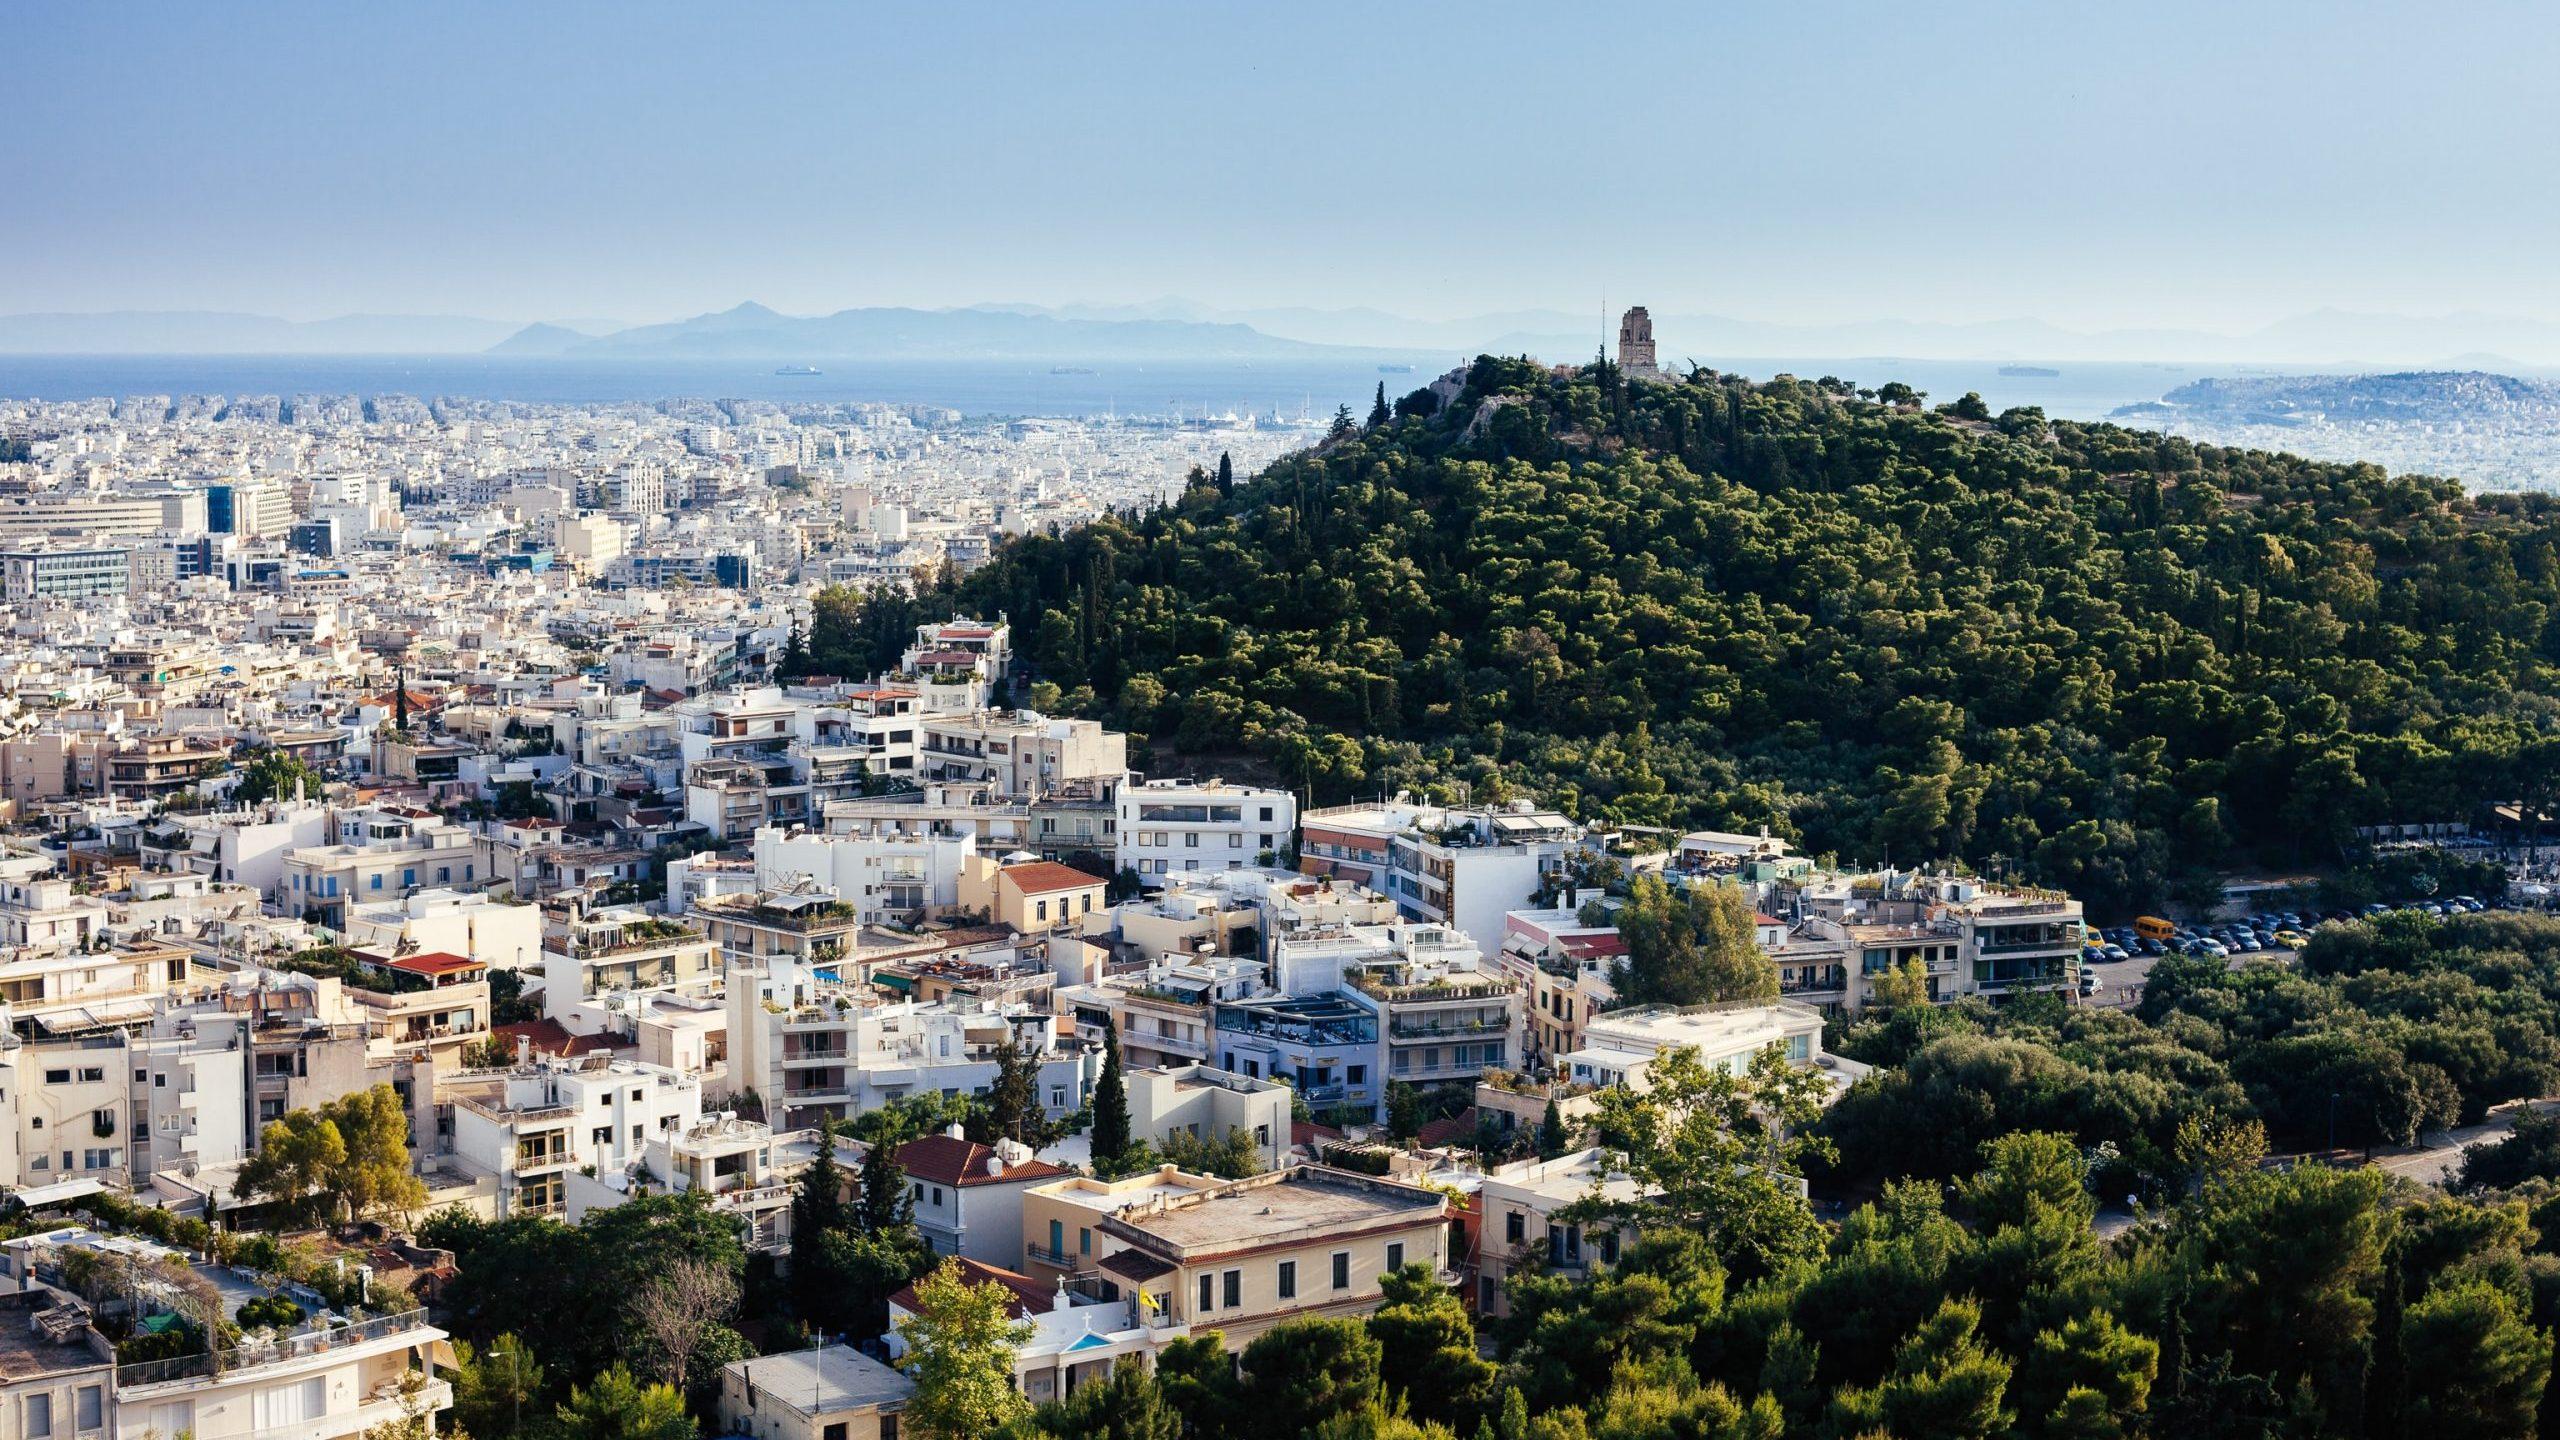 Athens, Greece. © Oleksii Khodakivskiy